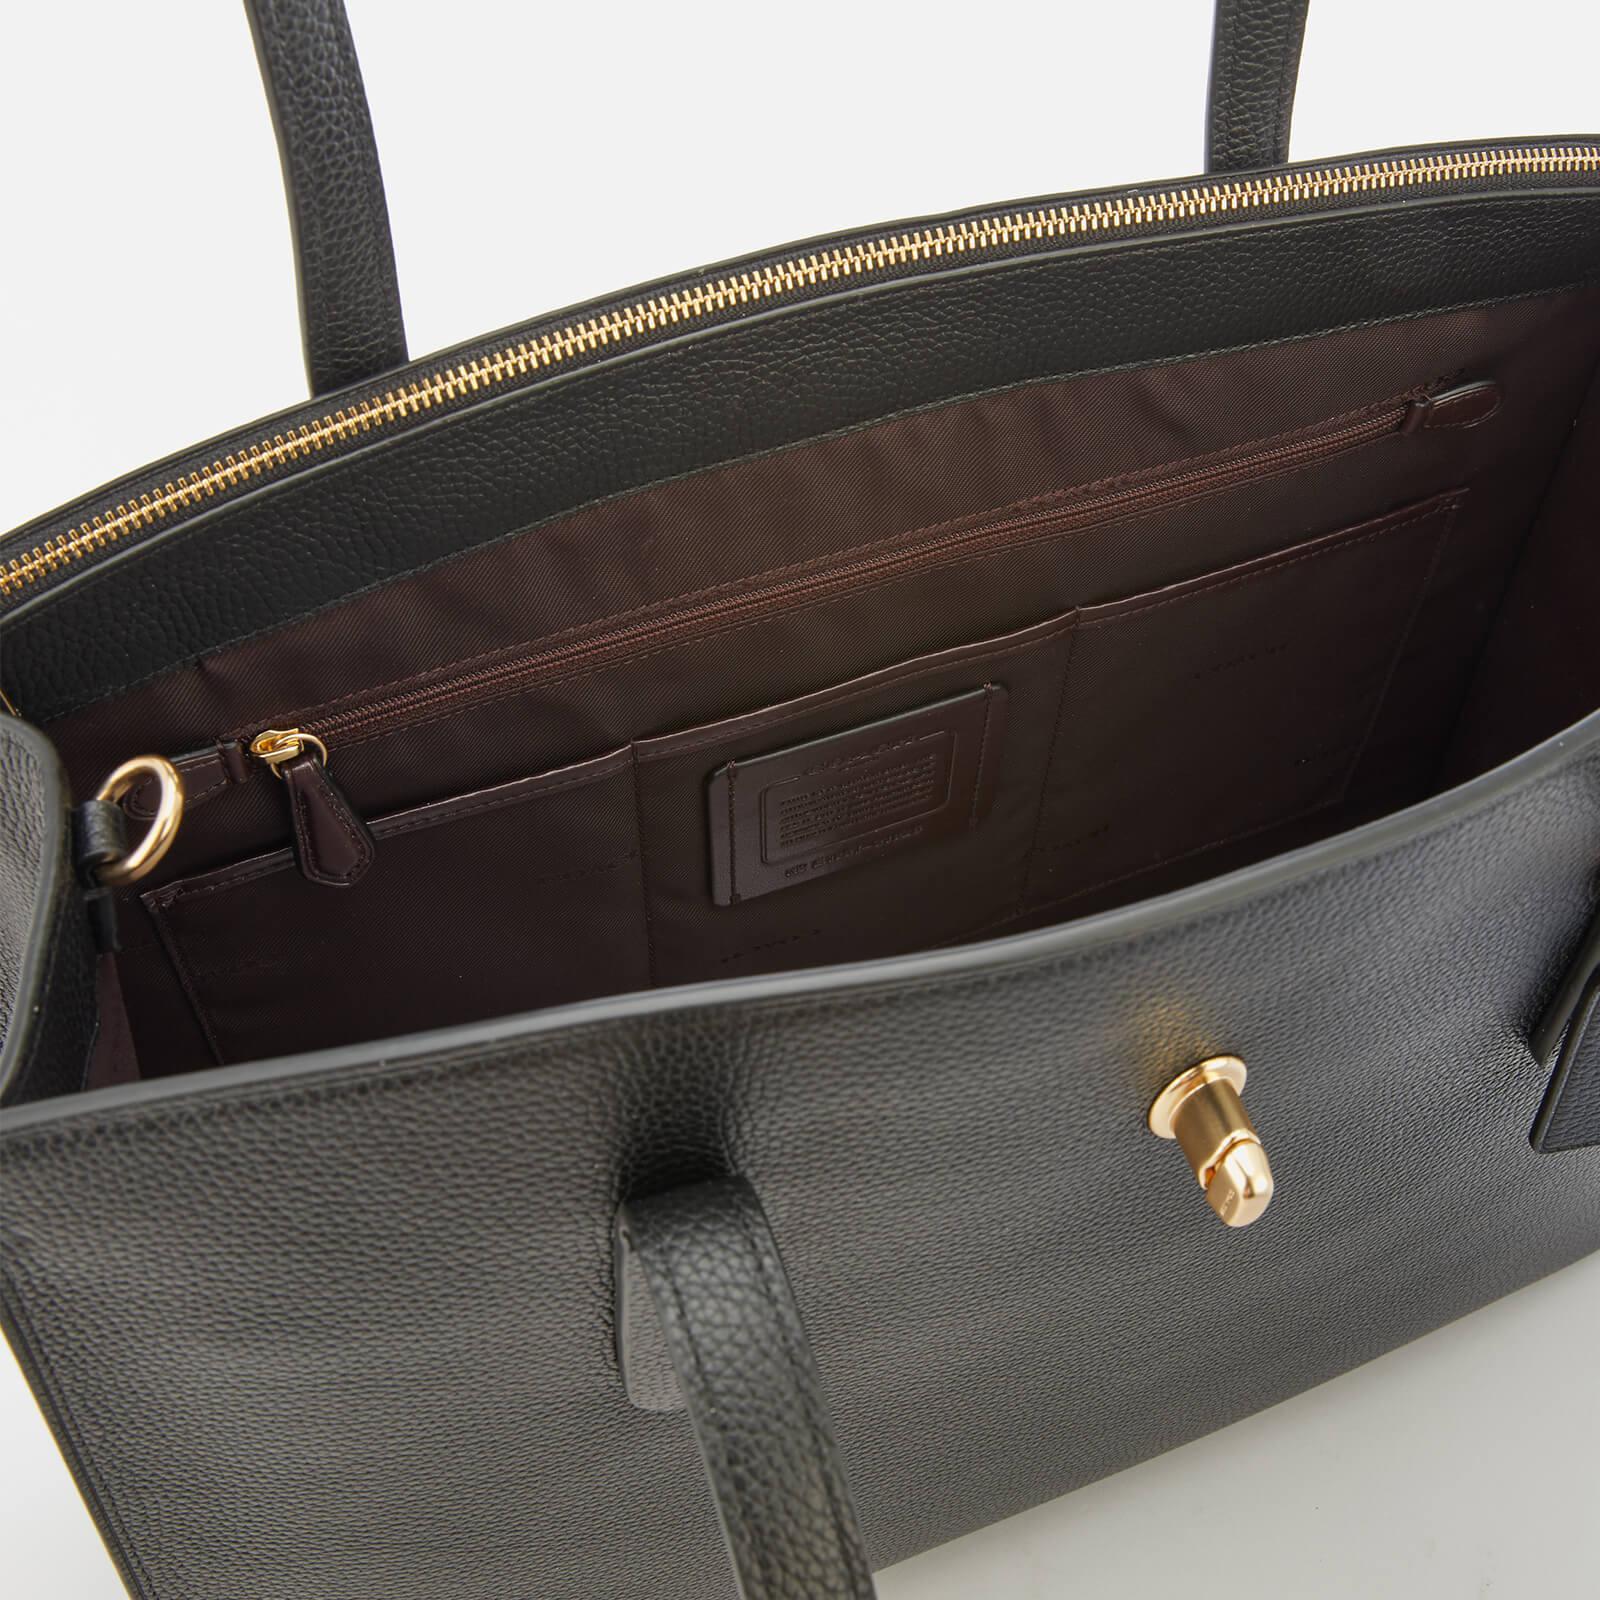 a2c2bb234c672 COACH Turnlock Charlie Carryall Bag in Black - Lyst